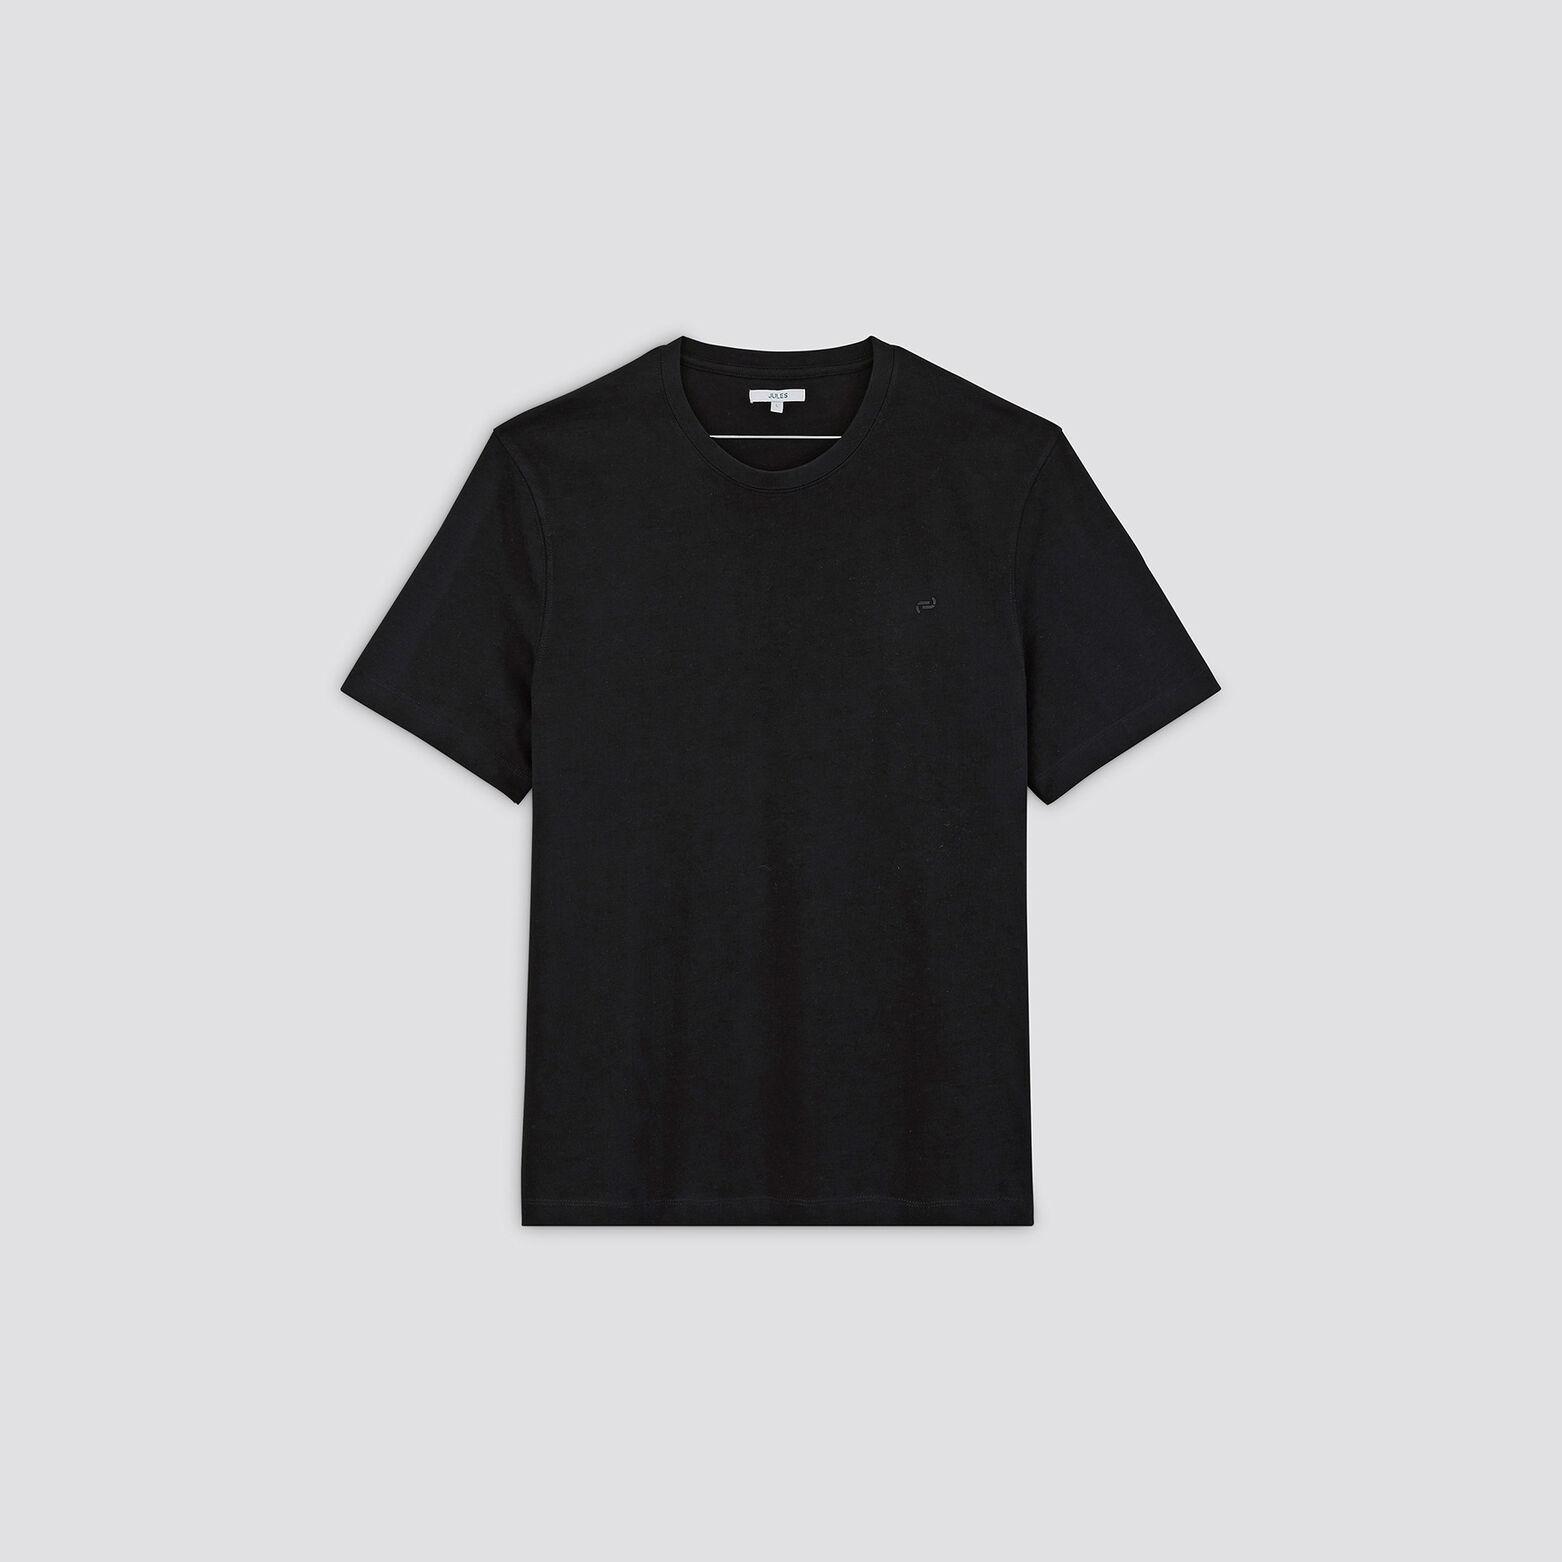 Tee-shirt Parfait coton issu de l'agri.bio